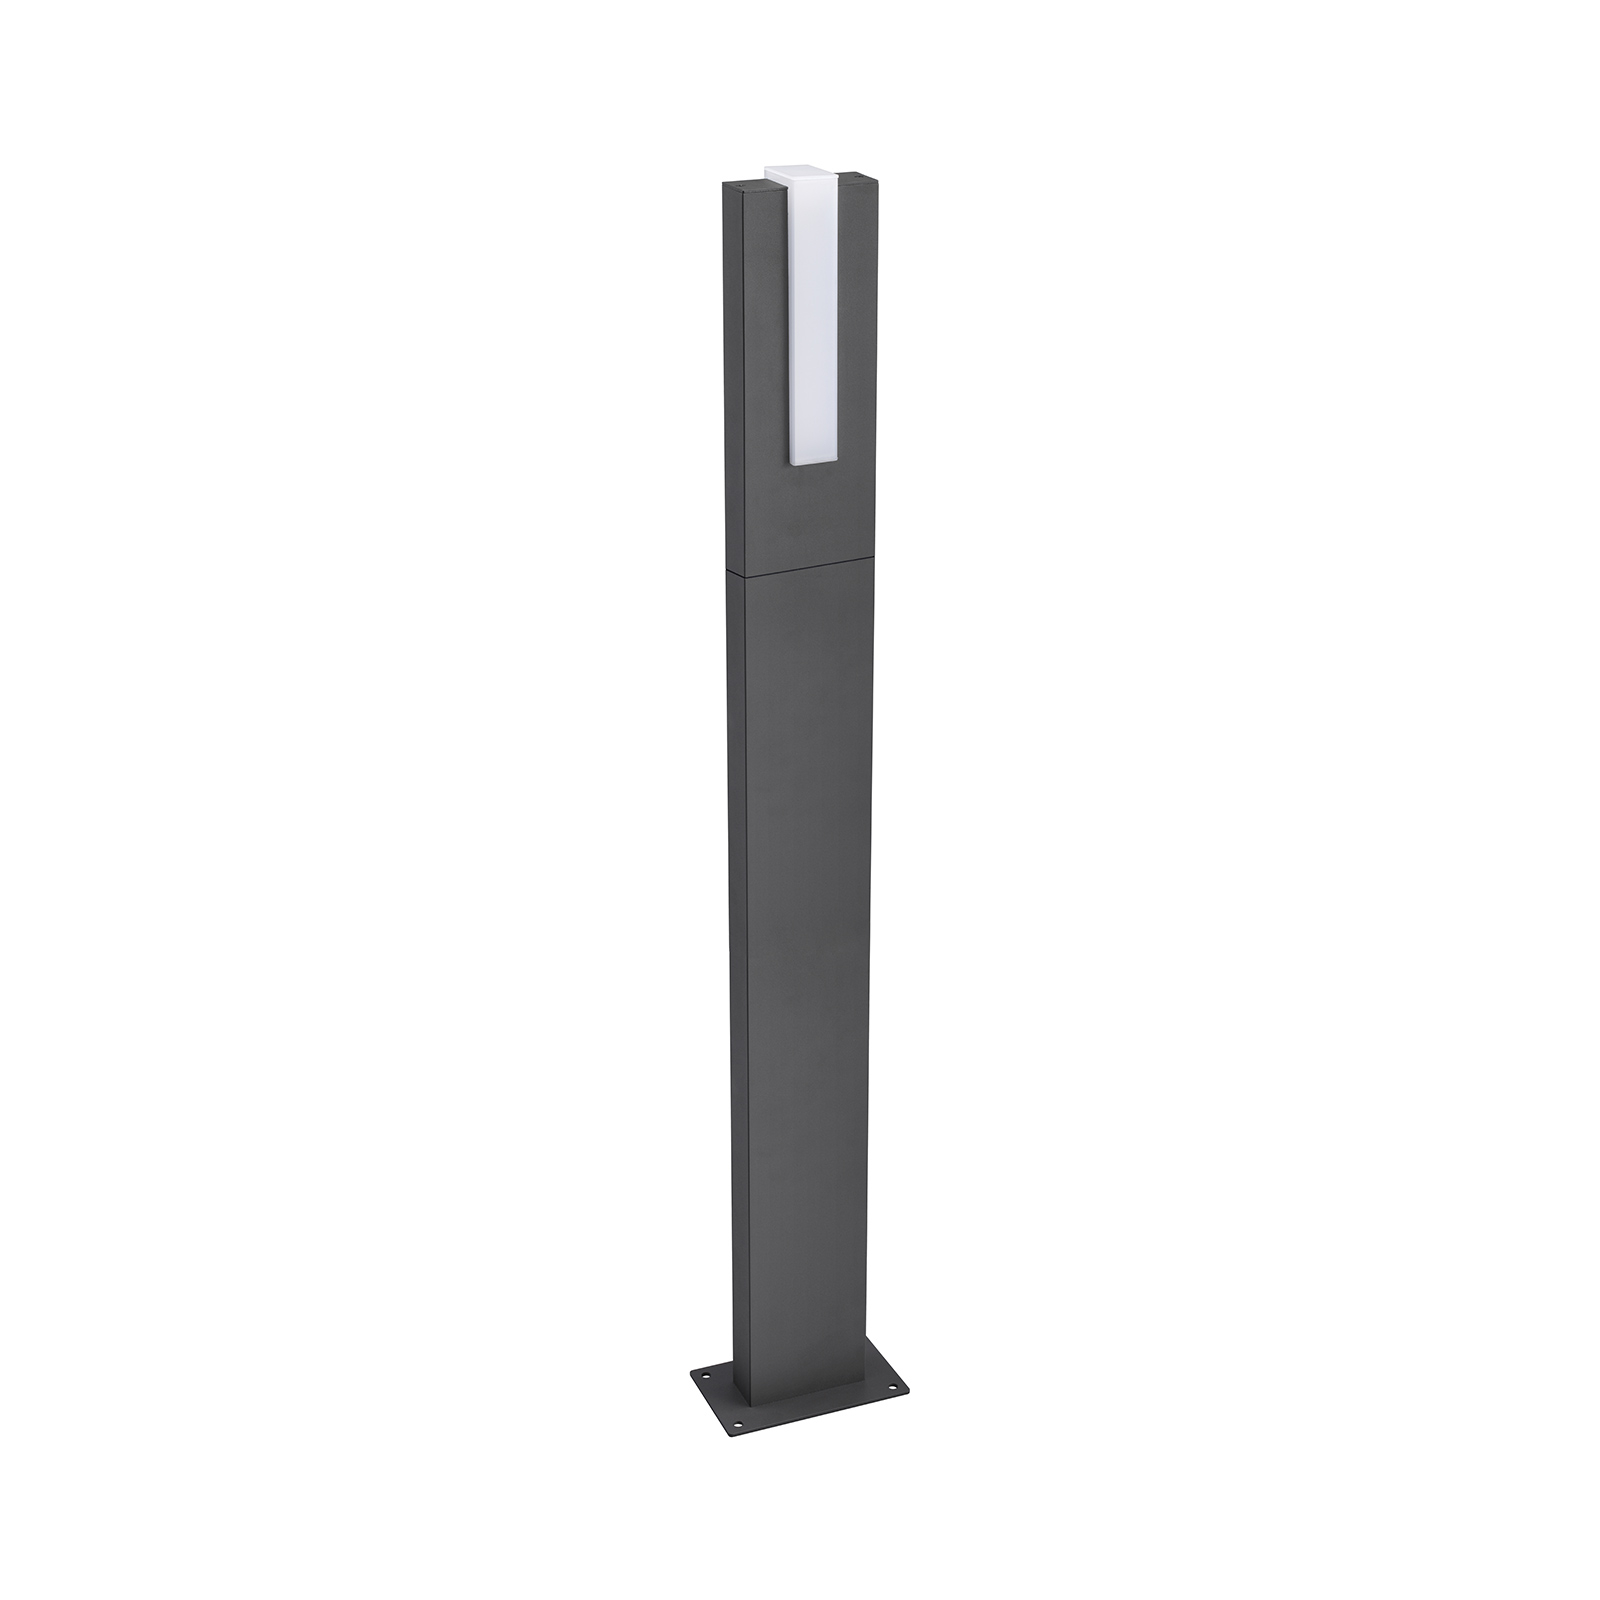 Lucande Virgalia LED-Wegeleuchte, 100 cm